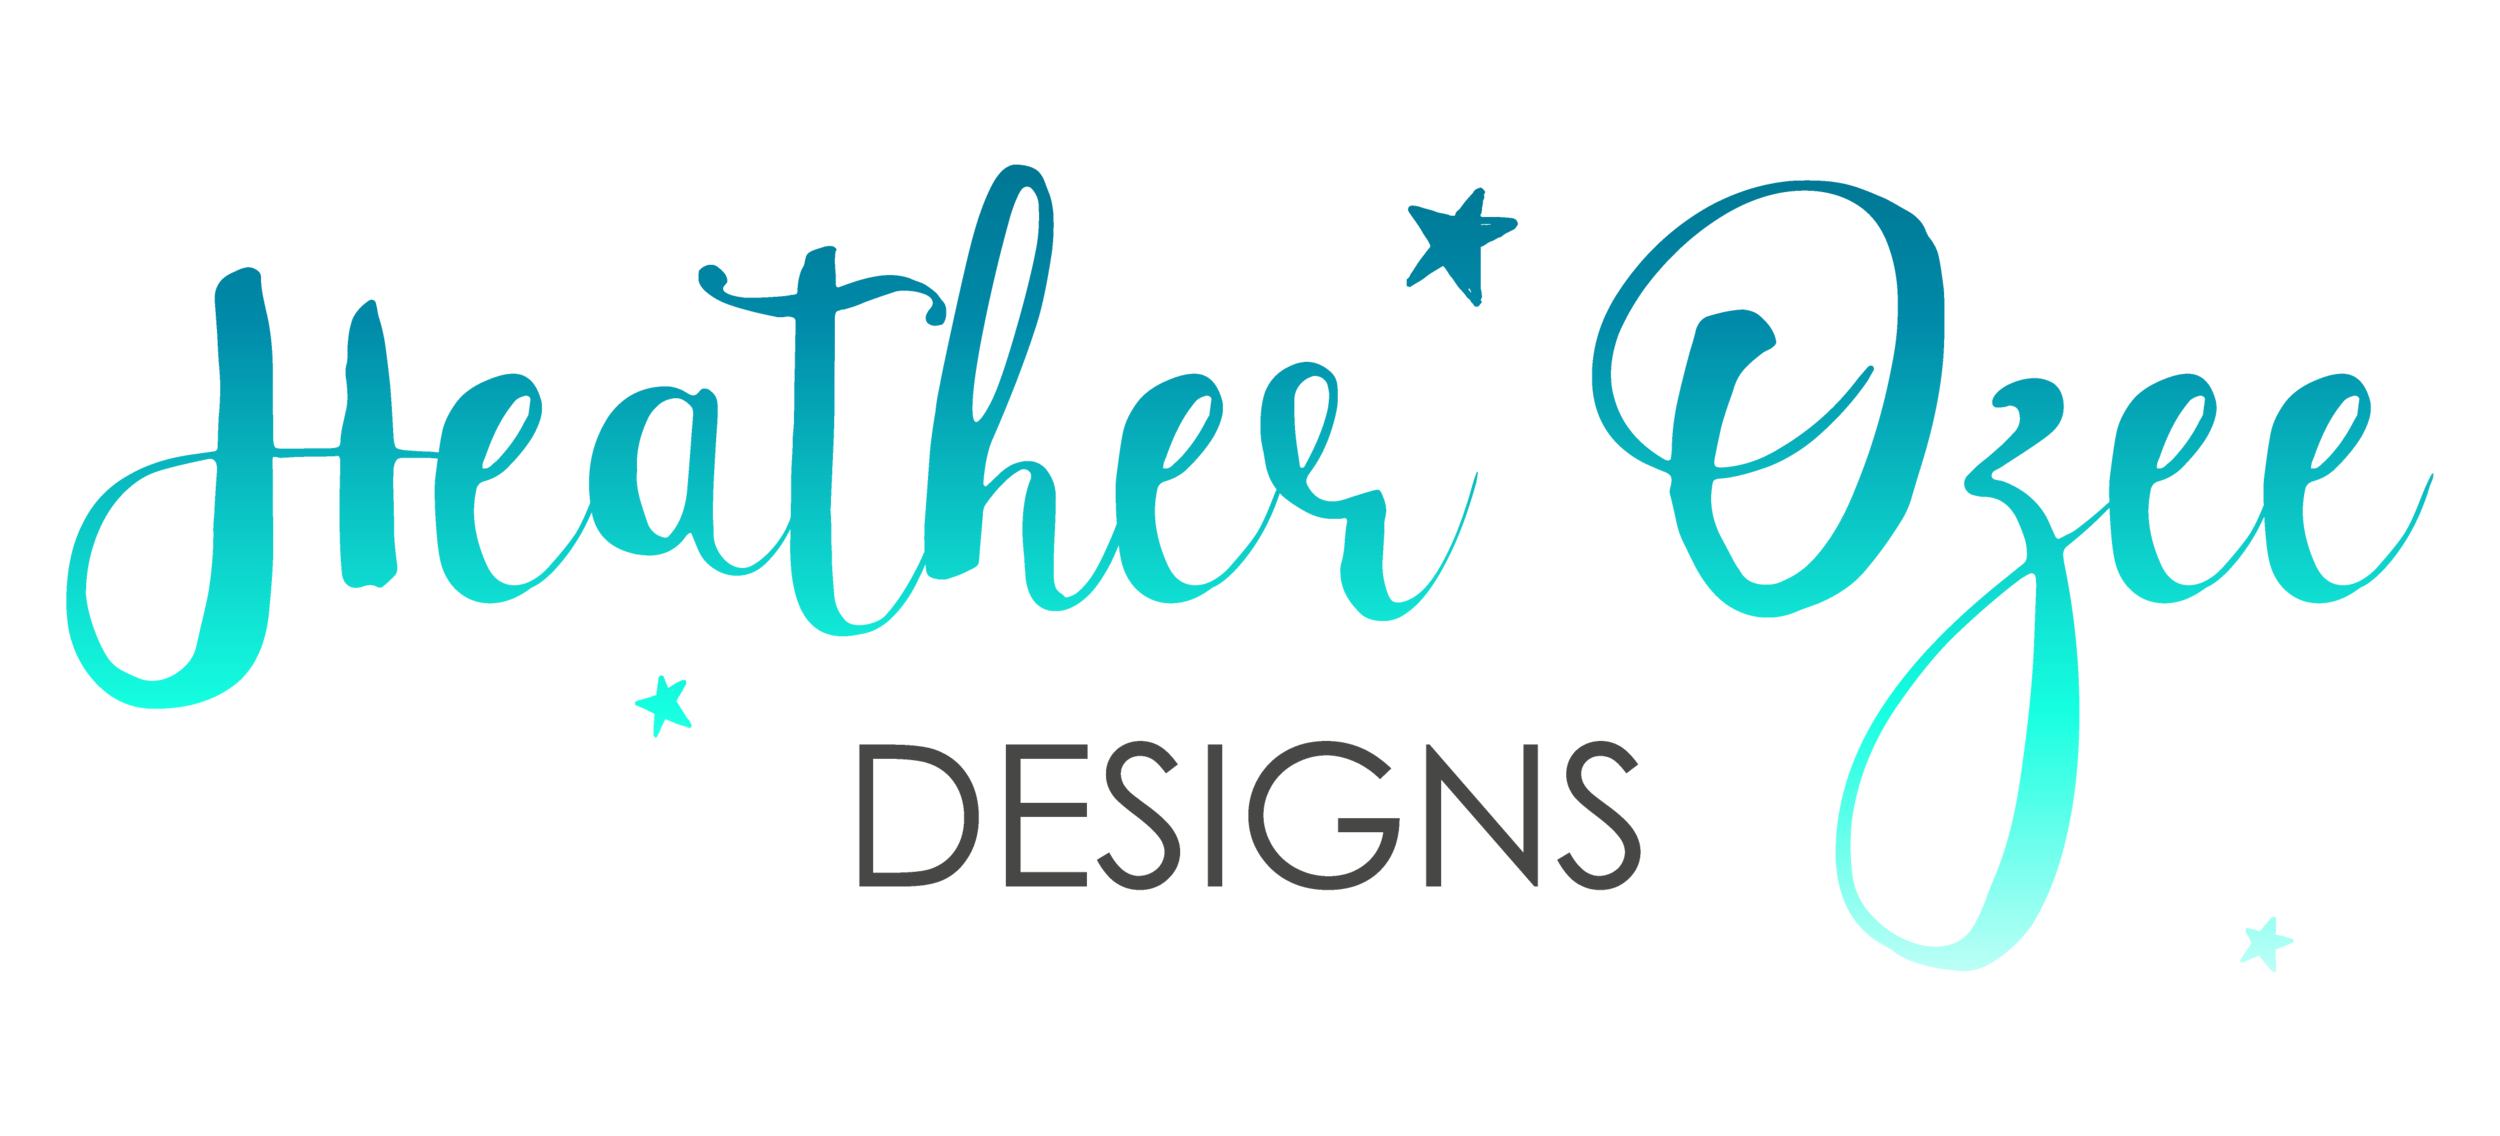 Art And Graphic Design Best Freelance Designers Best Graphic Artists Best Graphic Designers Best Logo Design Designer Freelancer Designer Graphics Designer Hire Find A Freelance Designer Find A Graphic Designer Online Find